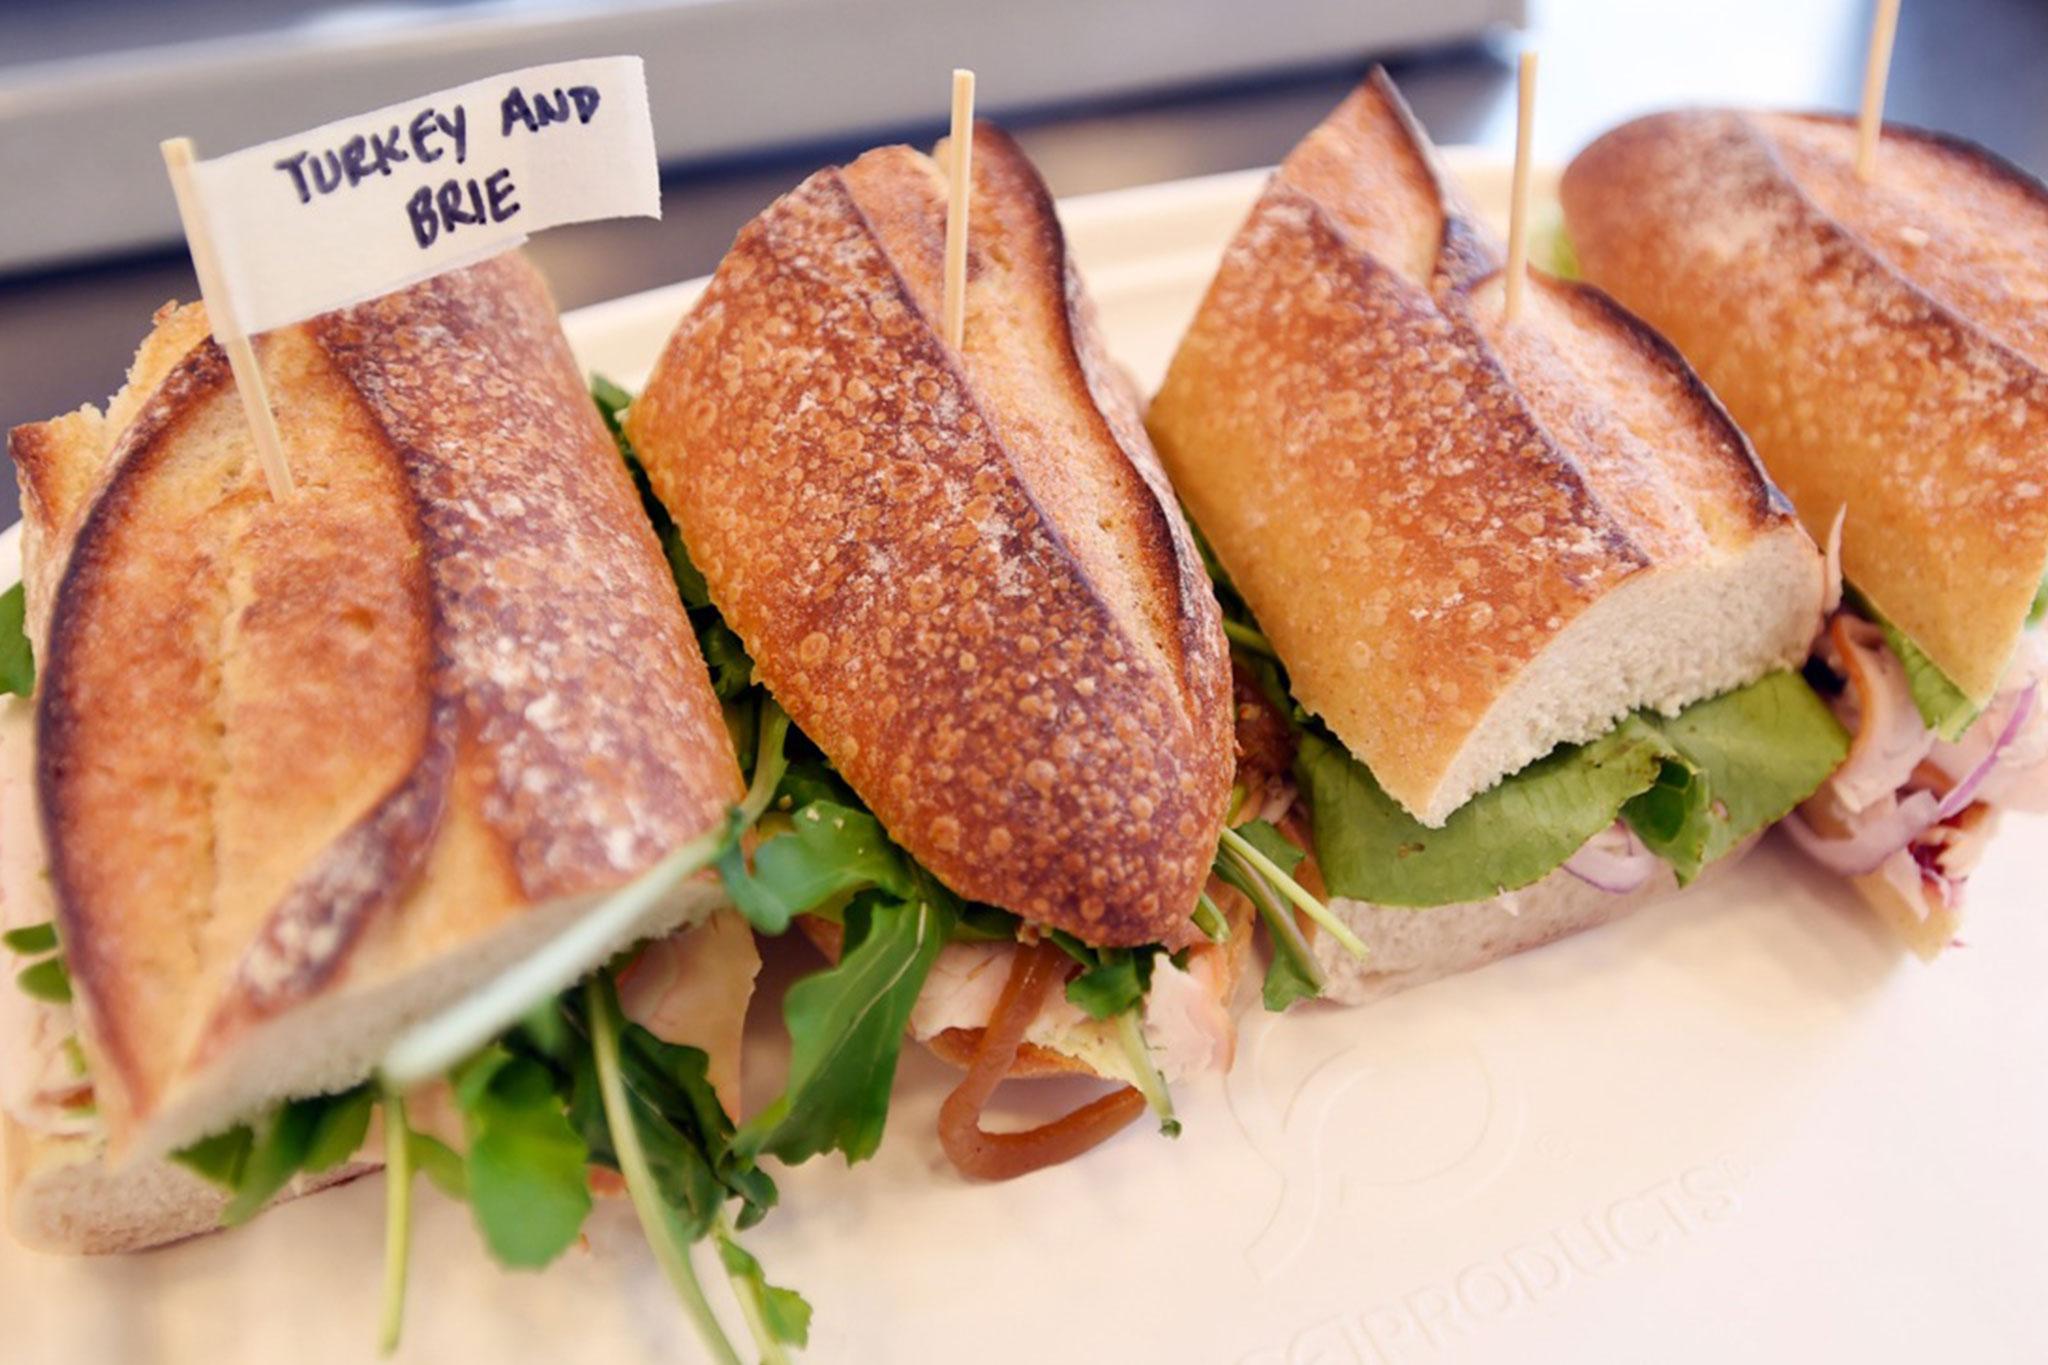 Inside The Kitchen: Organic Sandwich Company